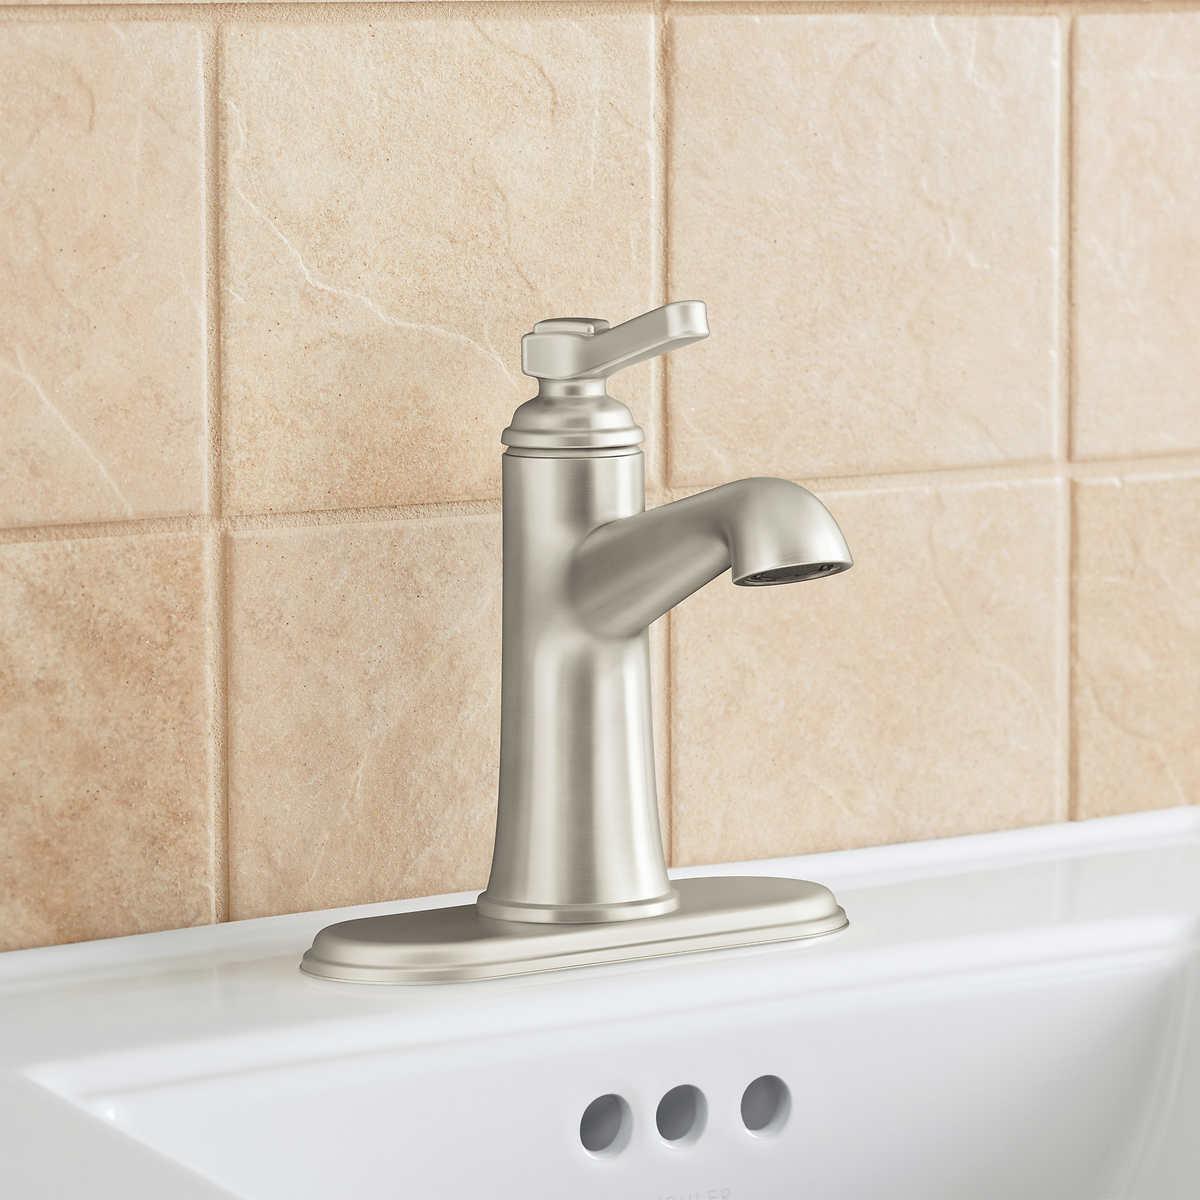 Kohler Georgeson Bathroom Faucet